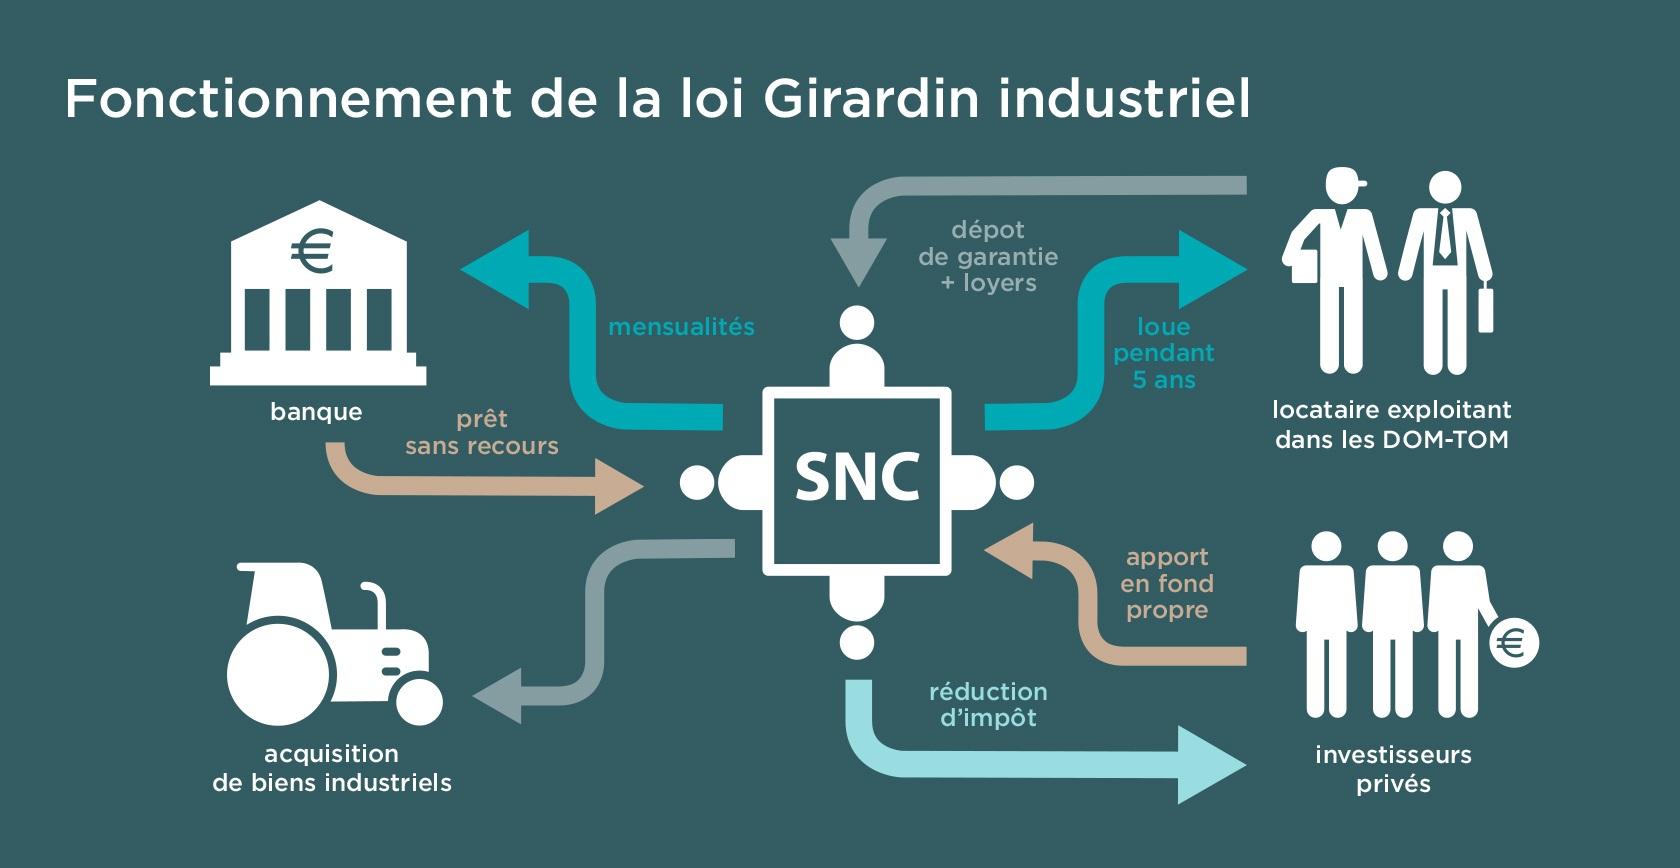 Girardin industriel fonctionnement